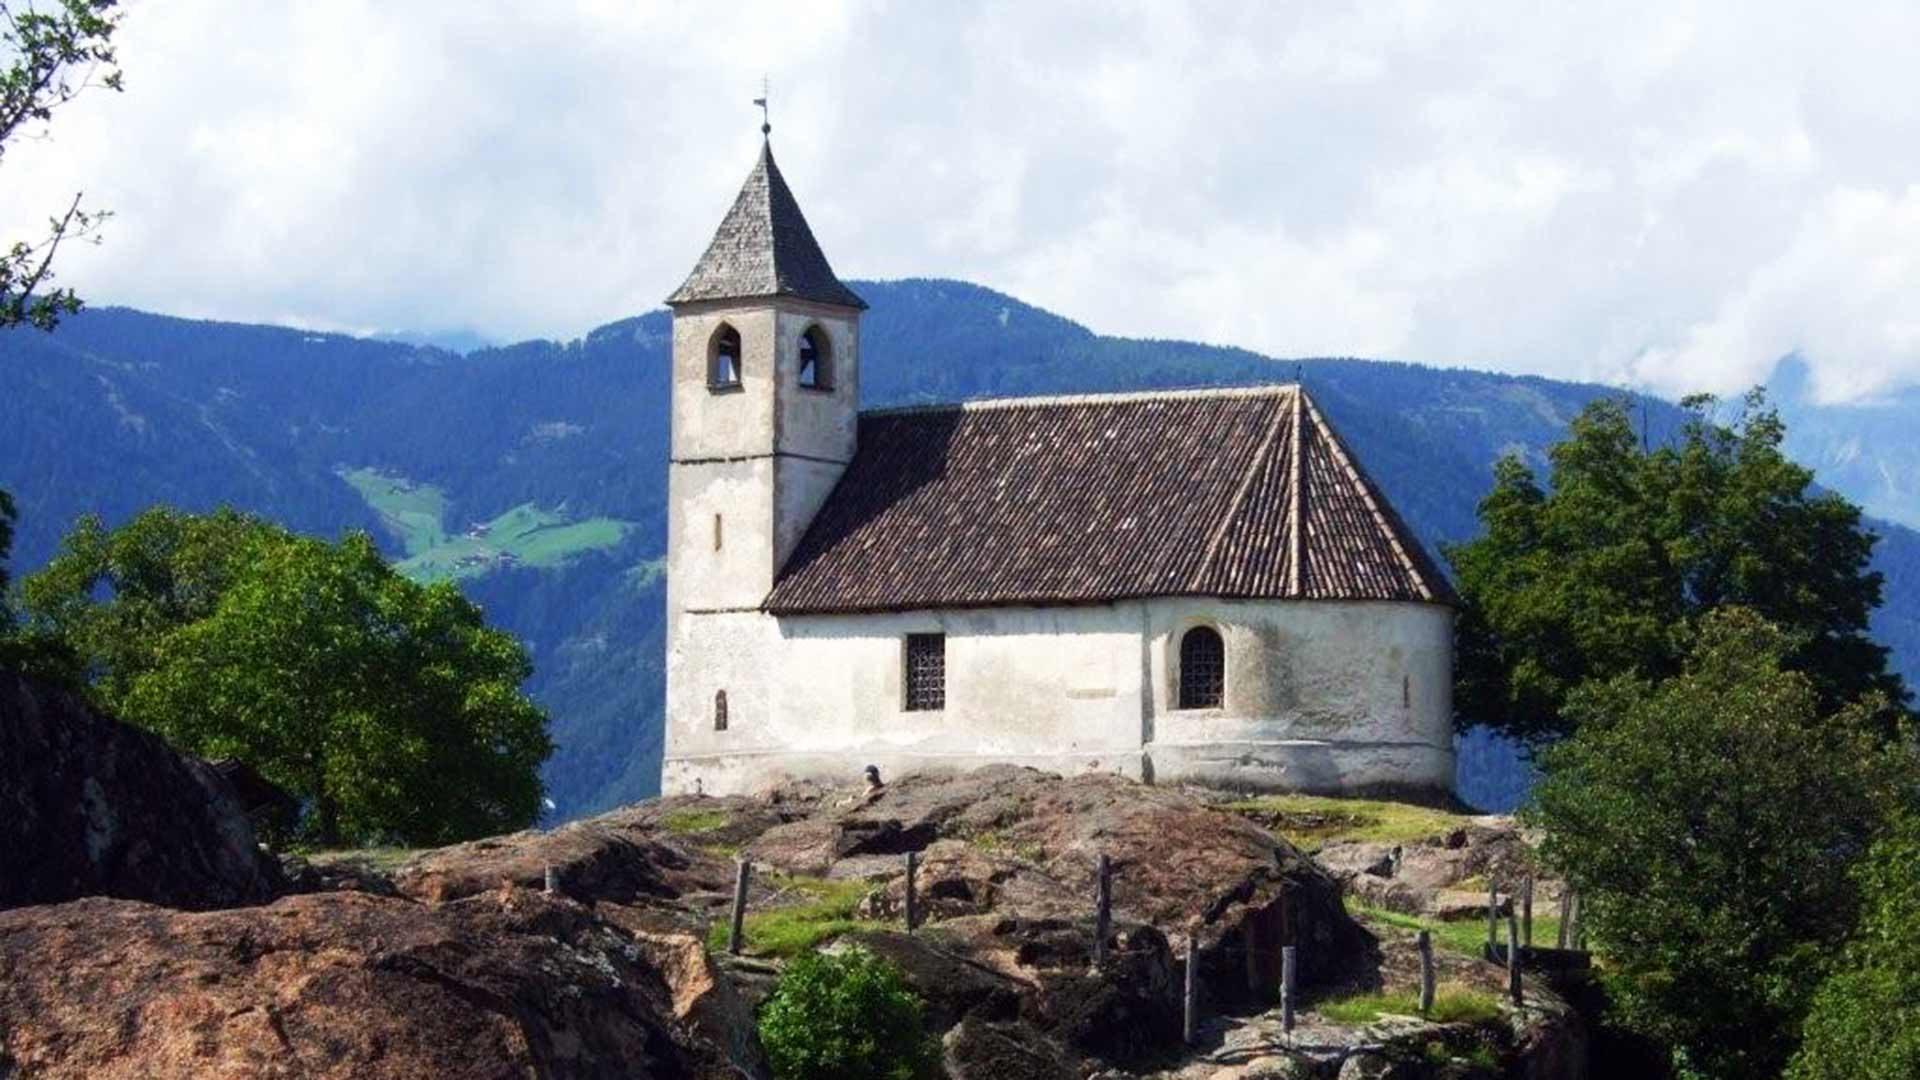 St. Hippolyt Kirchlein